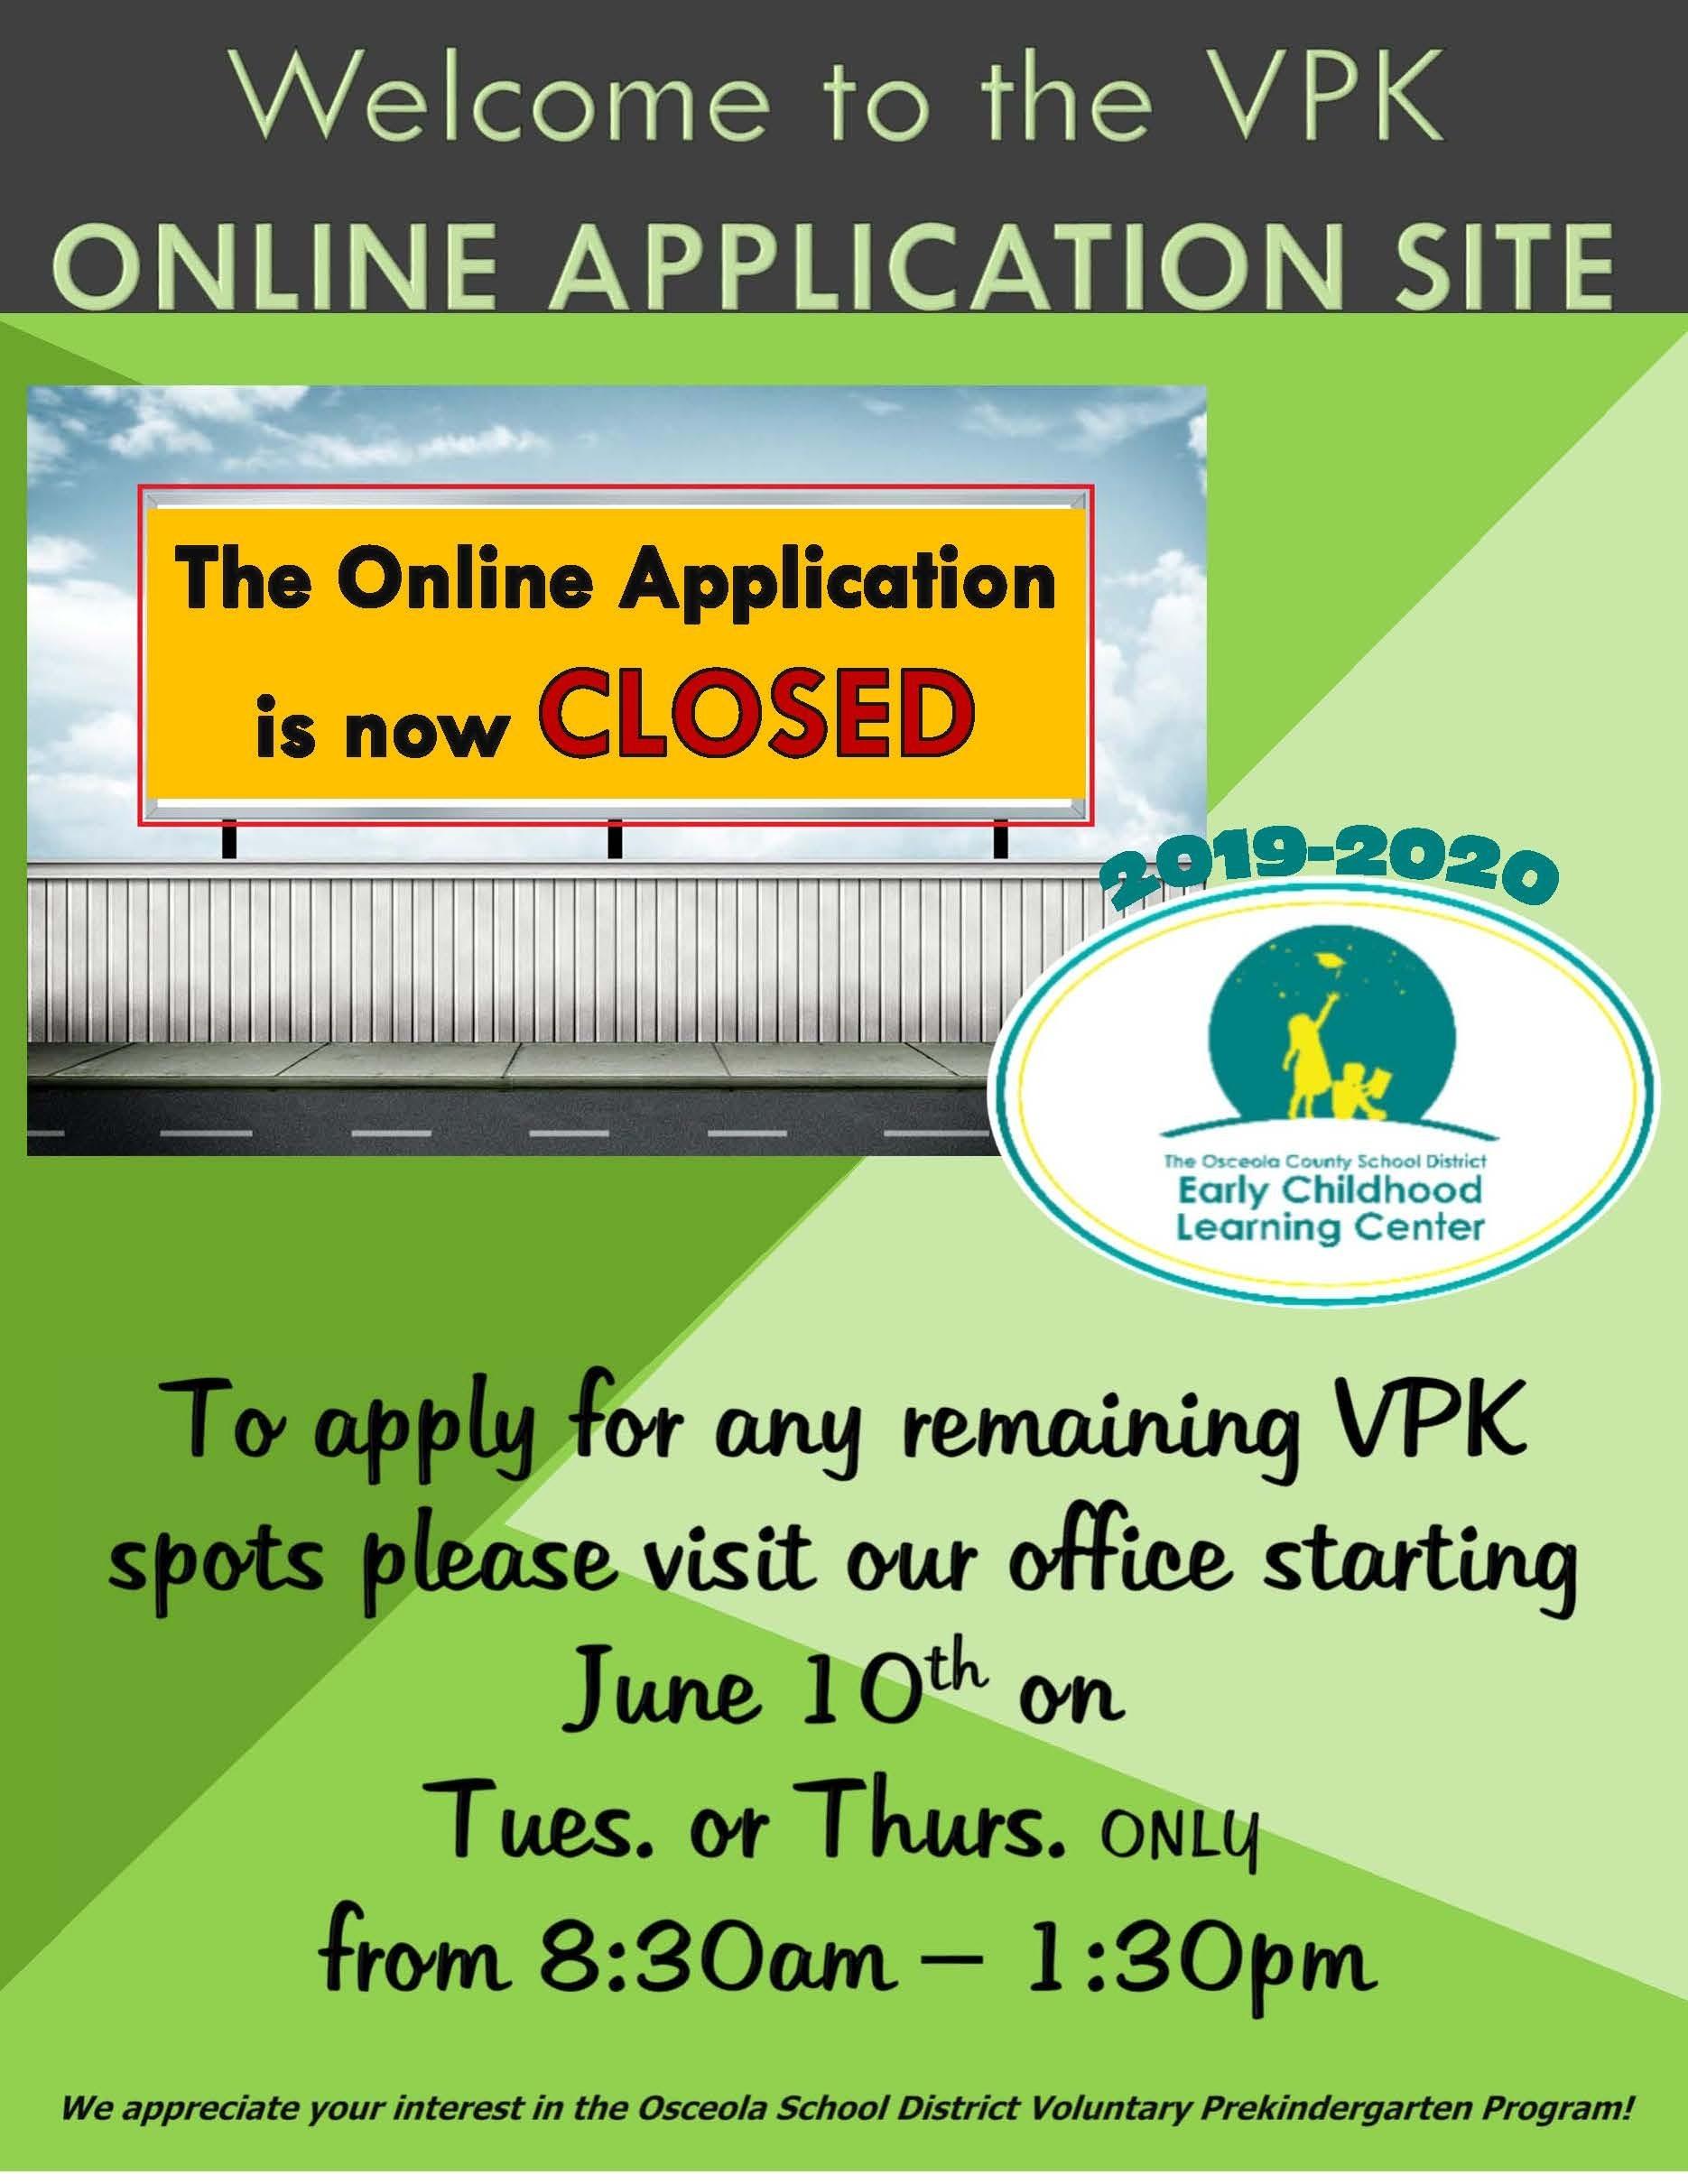 Vpk Enrollment Steps - School District Of Osceola County_School Calendar Osceola County 2020